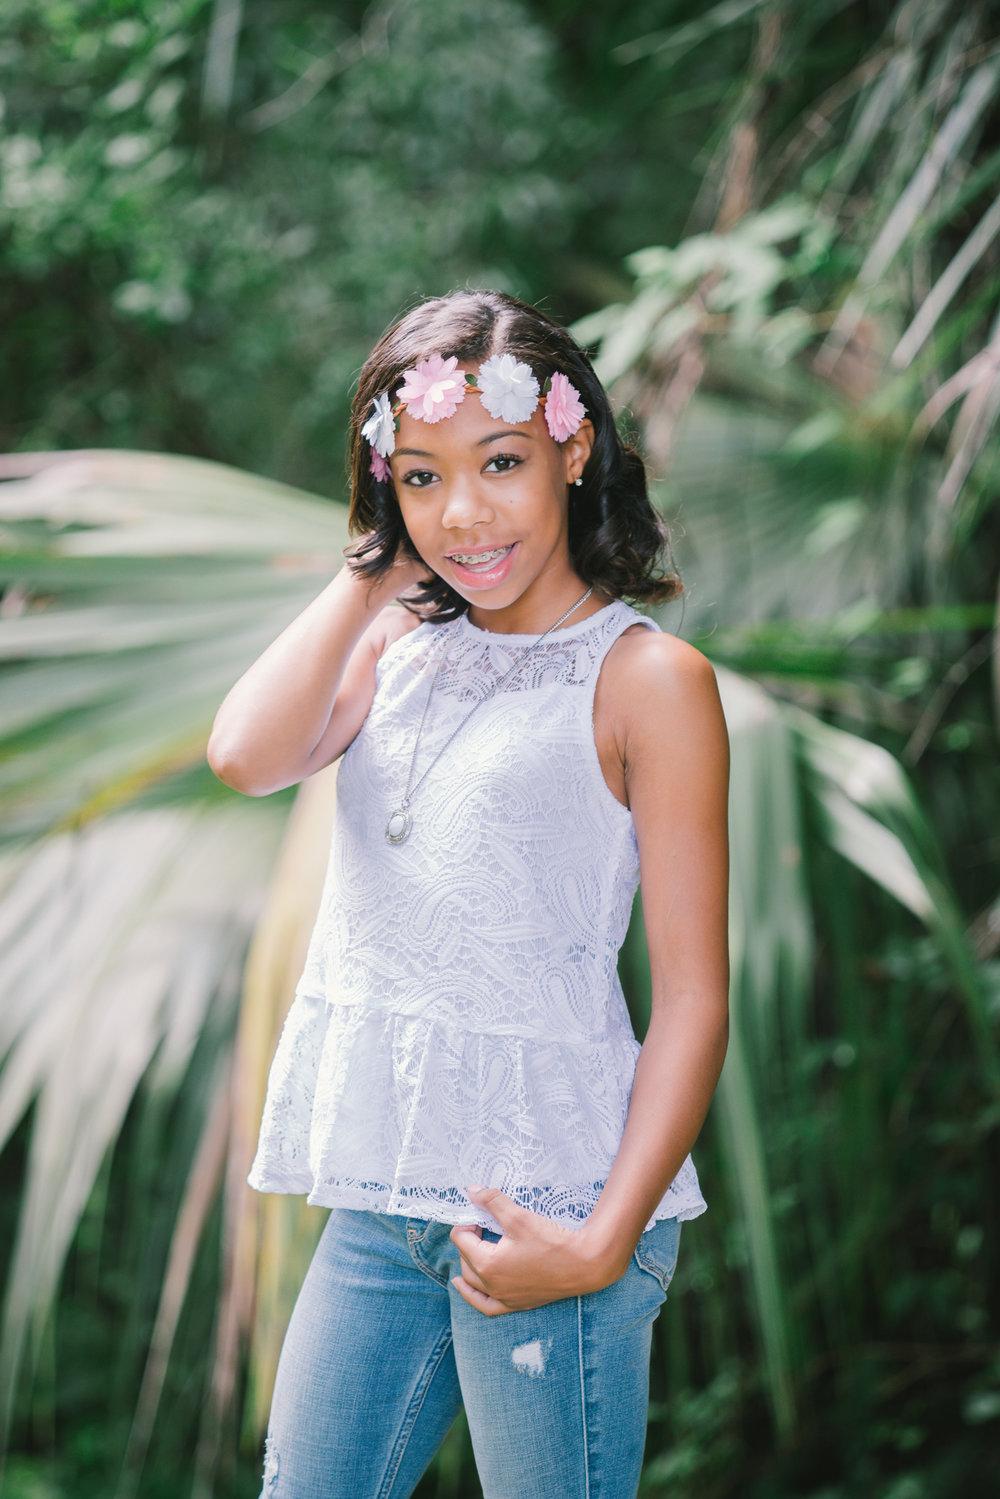 Tampa-children-photography, Tampa-model-photoshoot